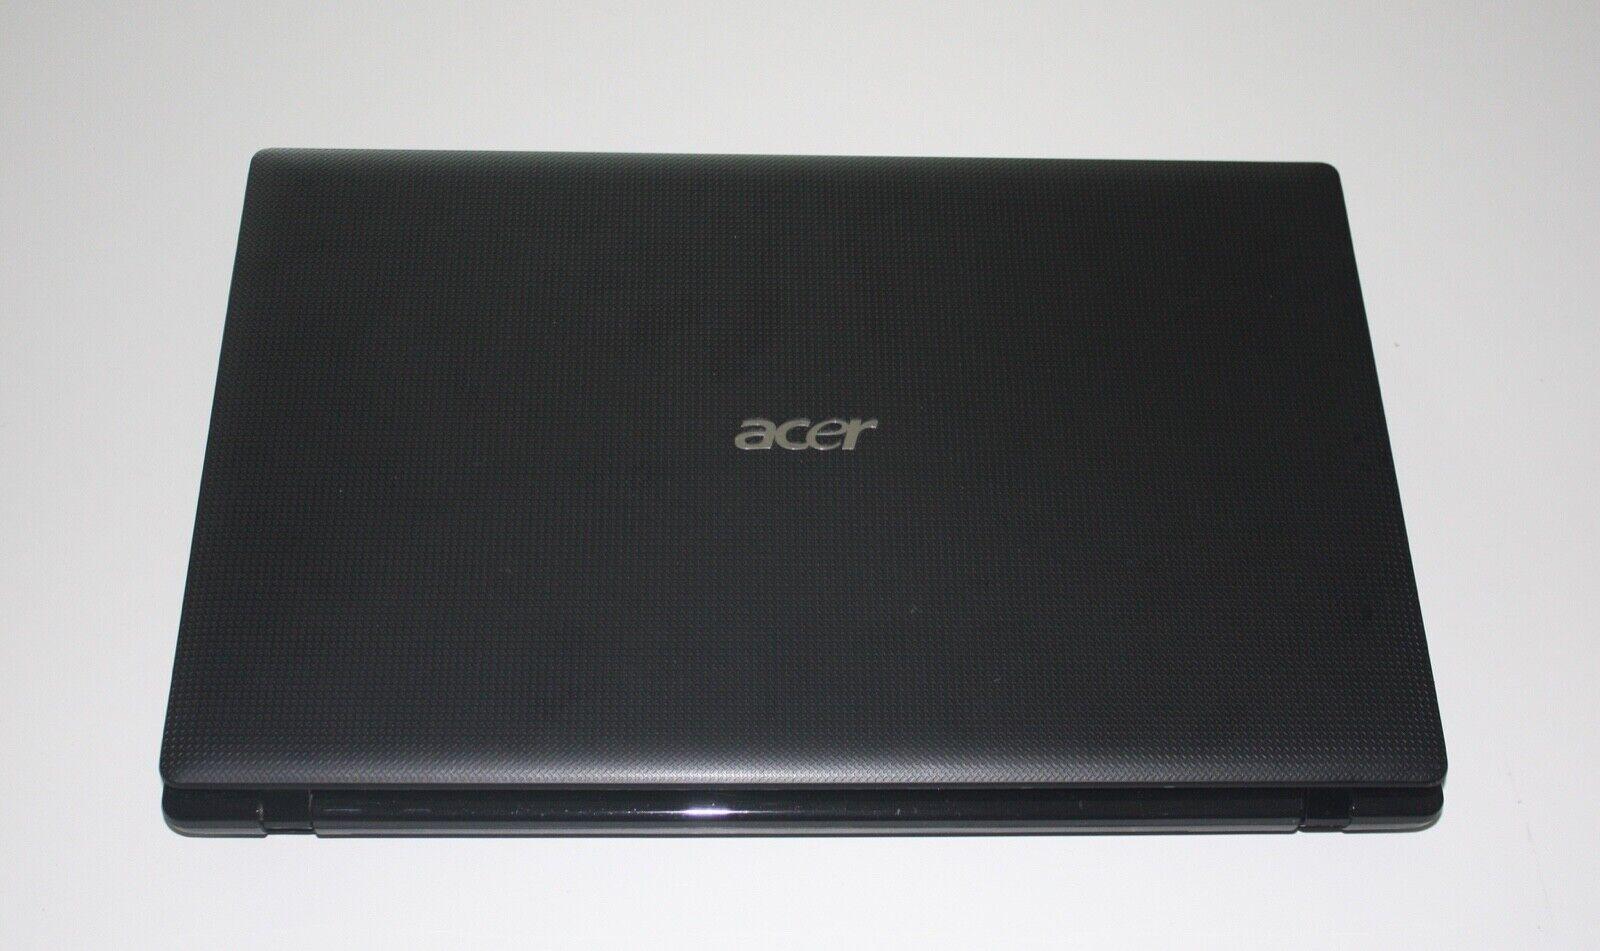 Notebook Acer Aspire 7750G